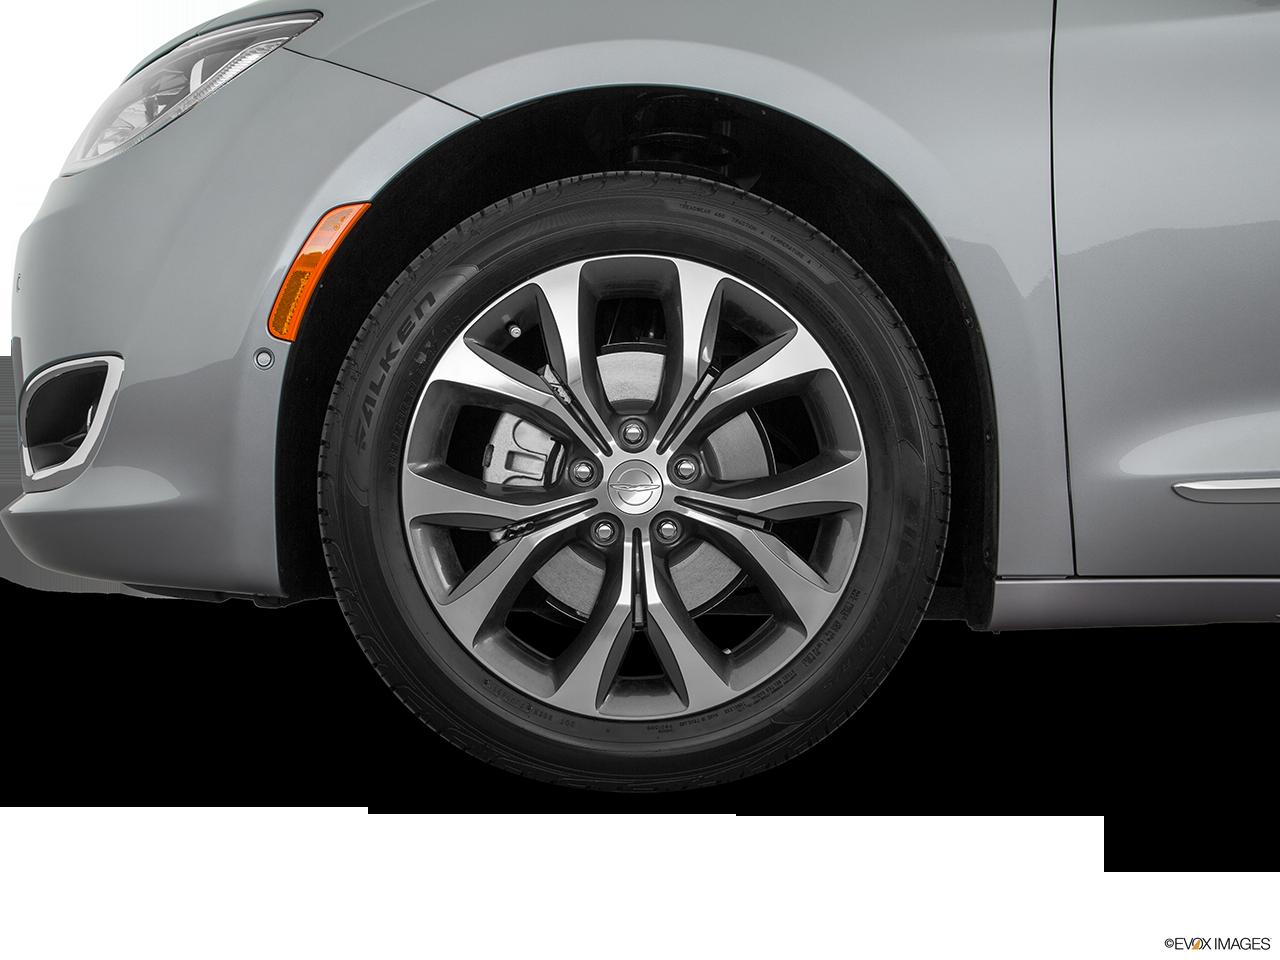 2019 Chrysler Pacifica photo